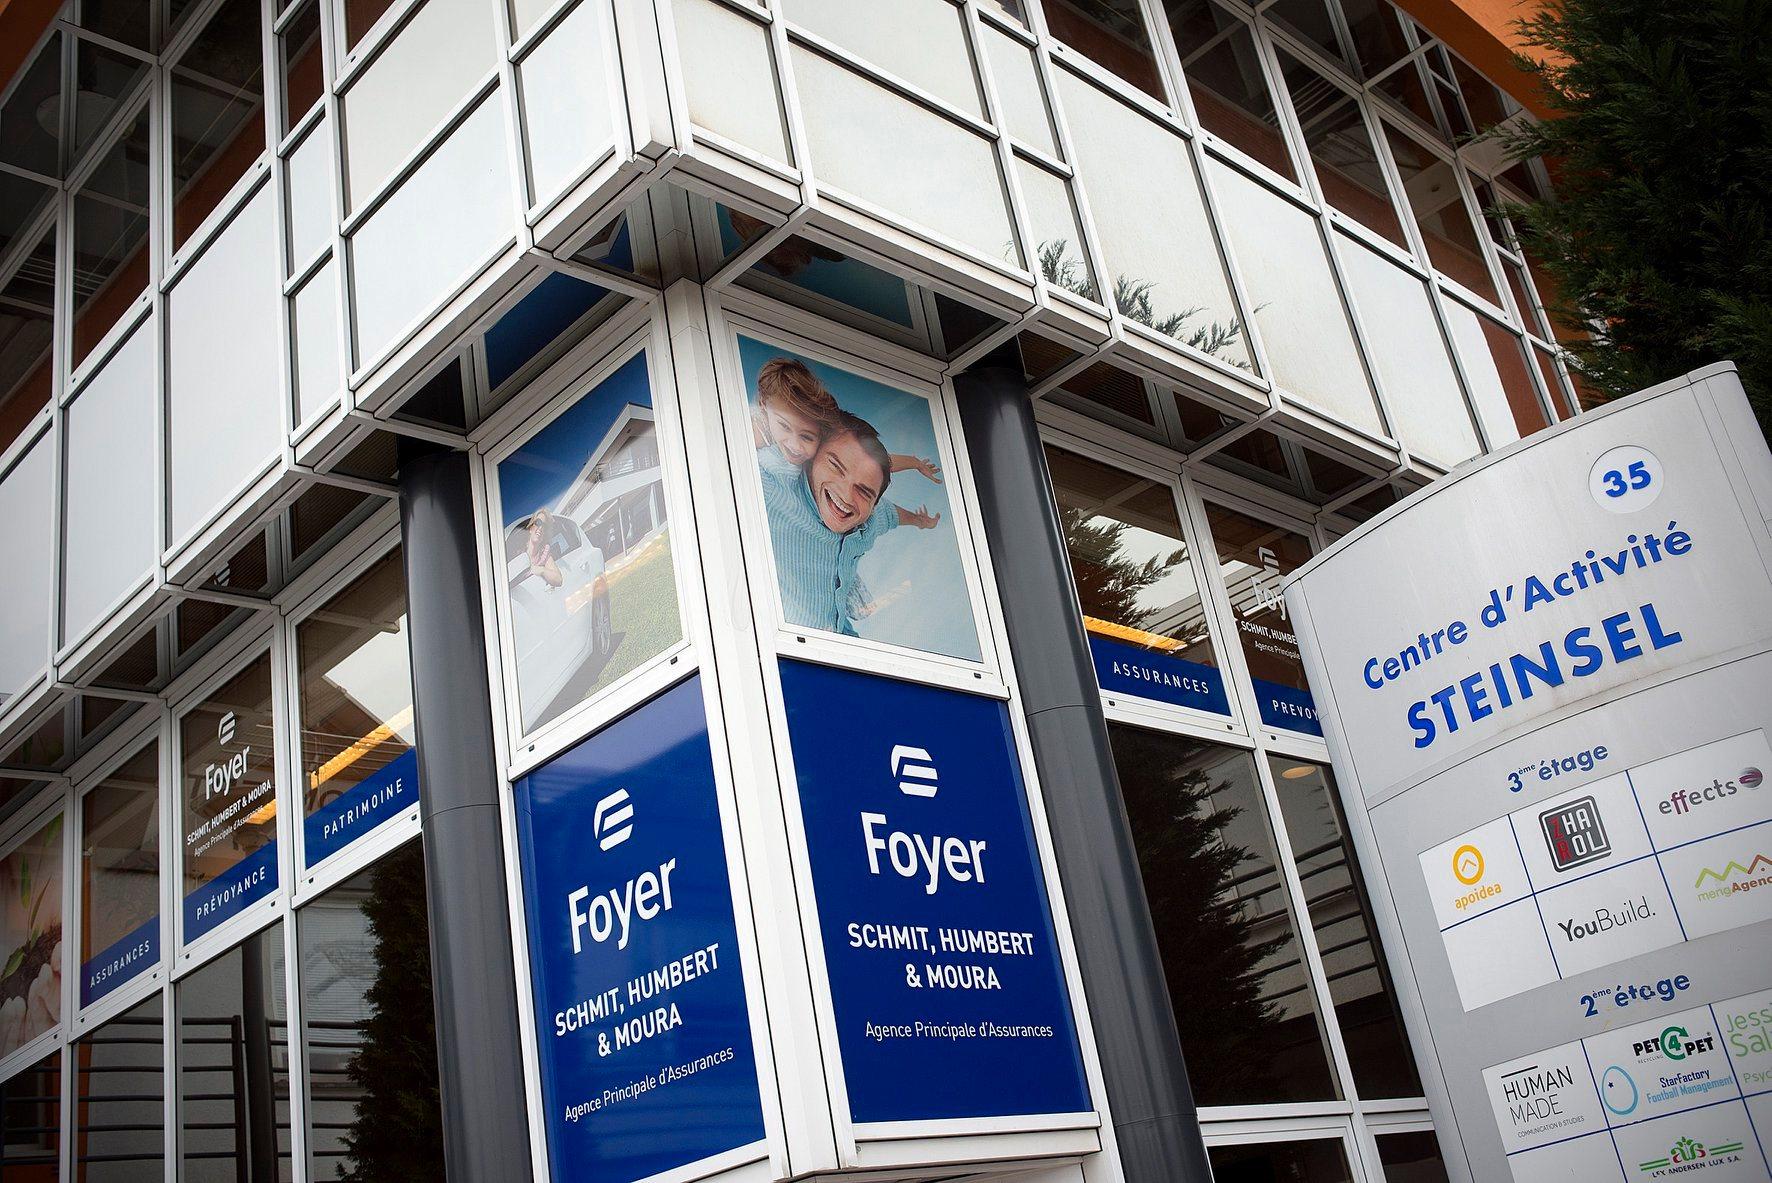 Partenariat ALEM – Agence Foyer Humbert Schmit, Humbert & Moura